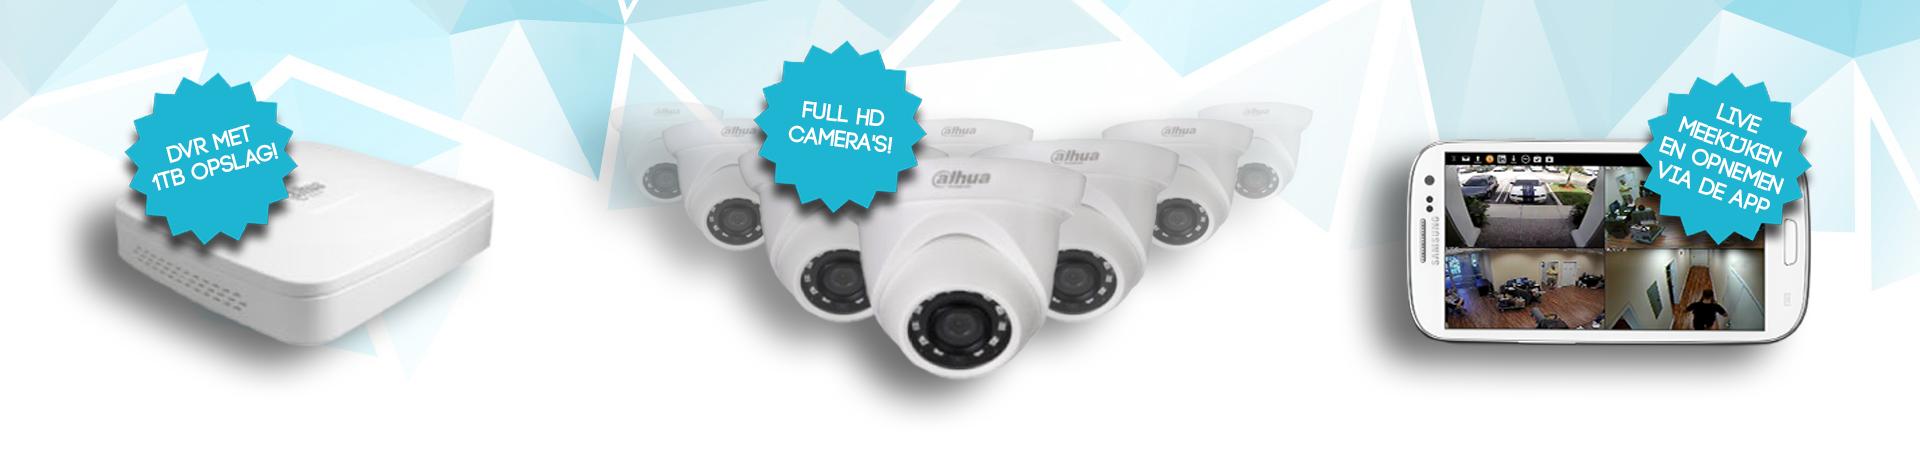 Forza camerabewaking pakketten